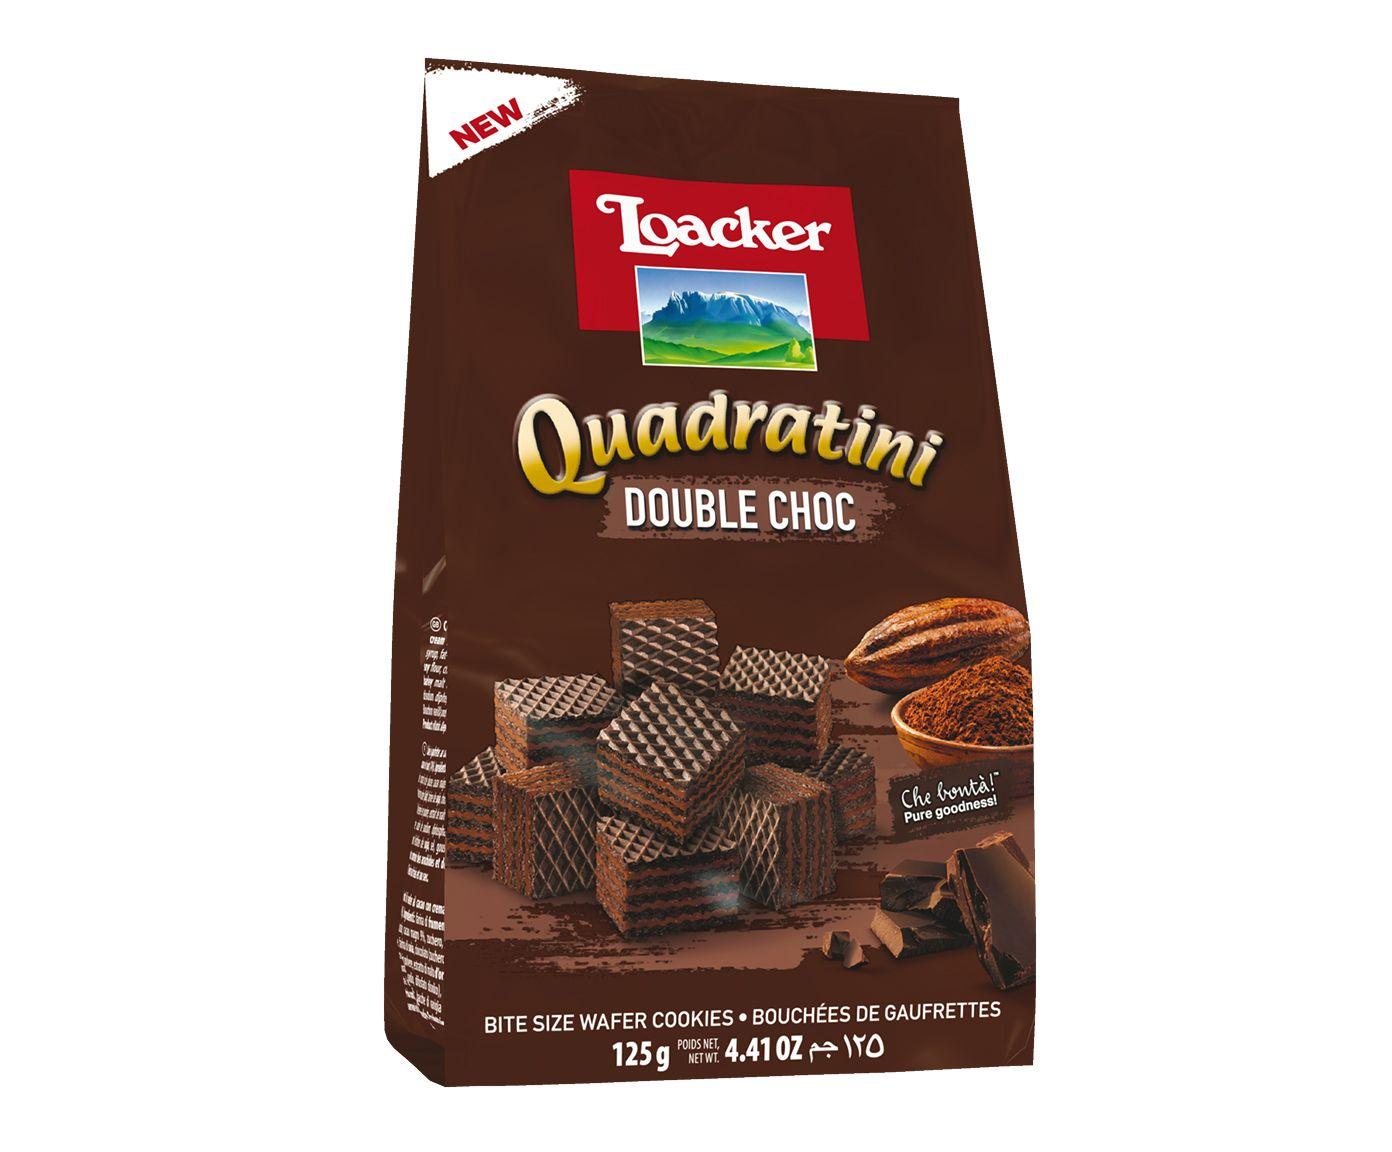 Biscoito Australiano Loacker Quadratini Double Choc - 125G | Westwing.com.br